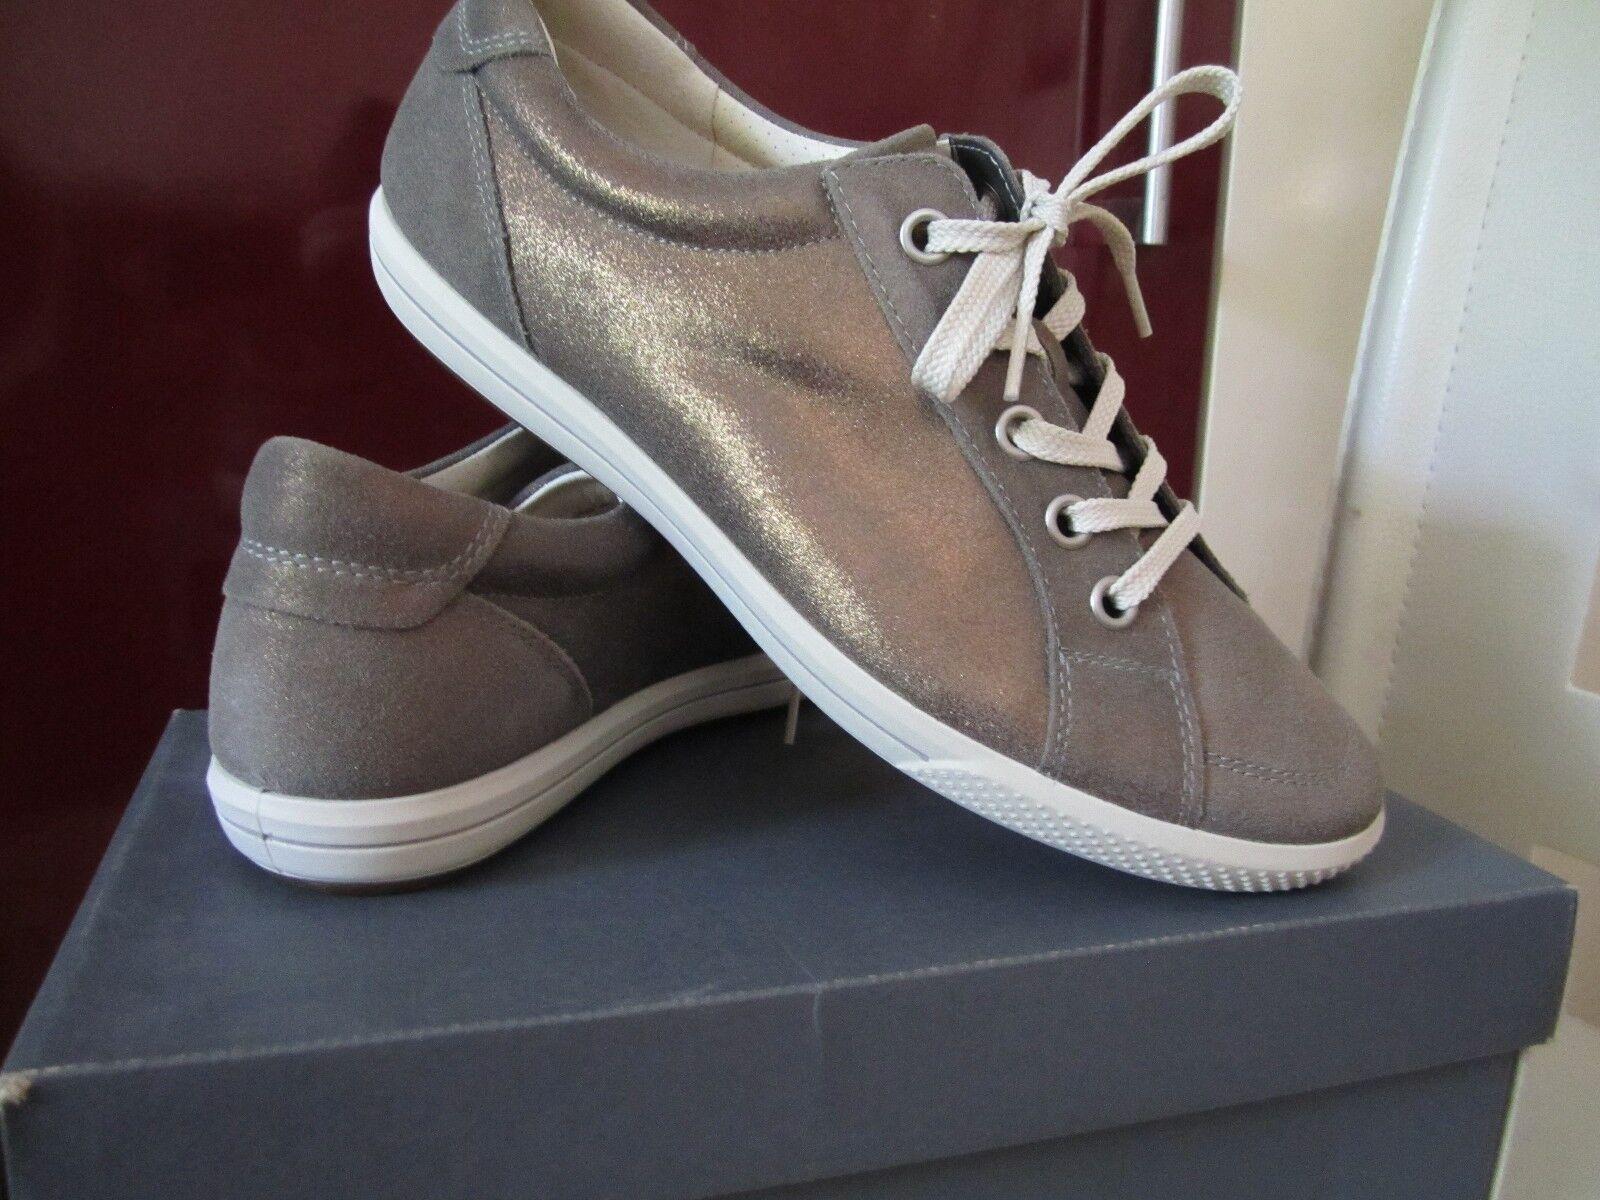 Ecco Schuhe warm Grau Damenschuhe  Schnür-Halbschuhe 20014305375 NEU Gr.42